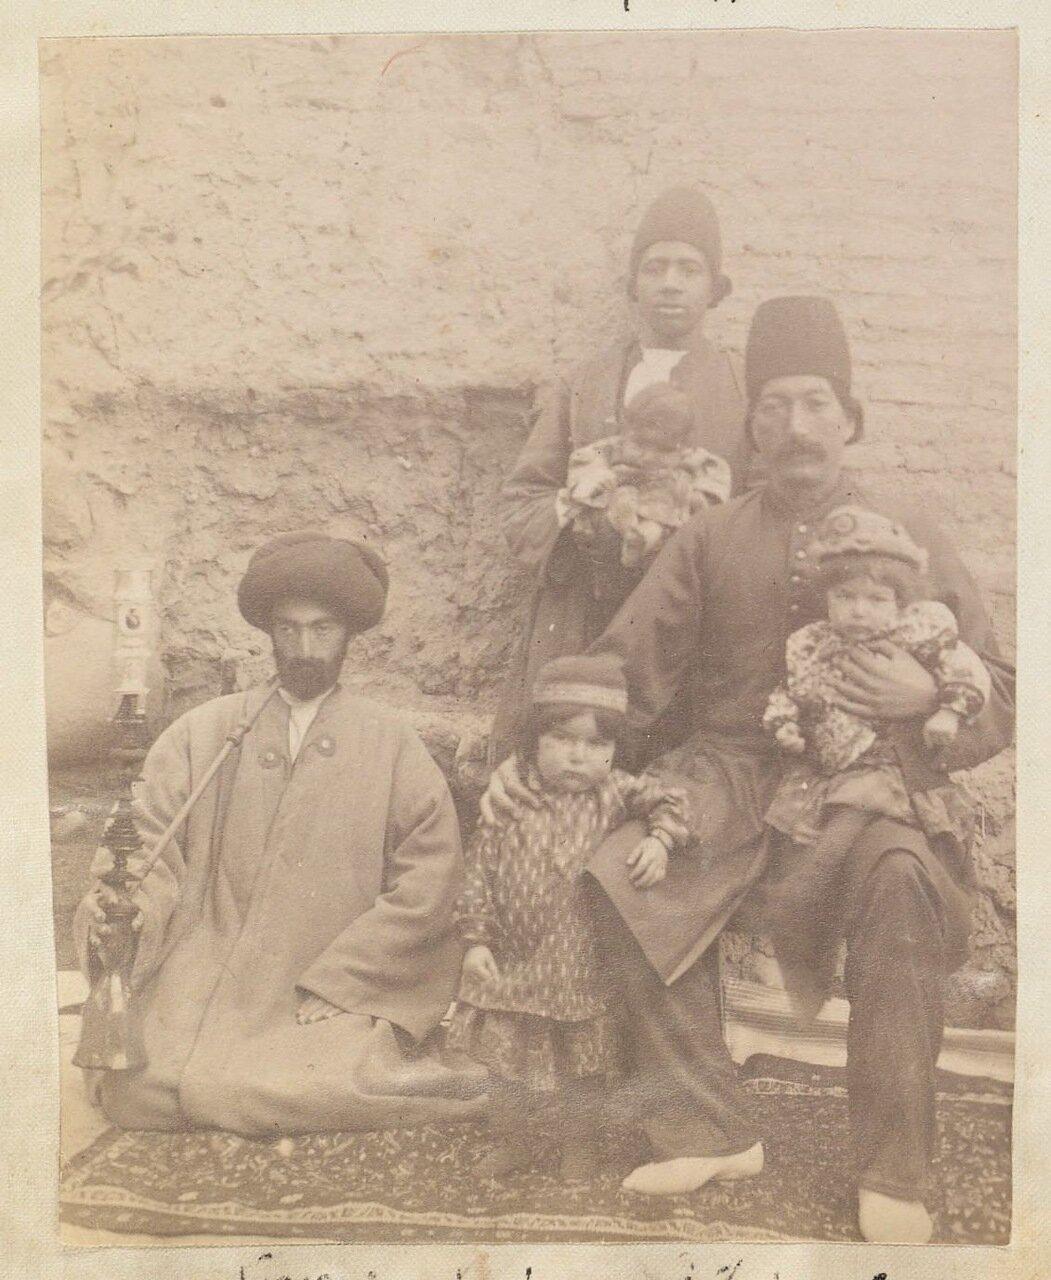 Мухаммад Хусейн Мирза, офицер Сараб, сын Хаджи Мирзы Наср Аллаха и Навваб Исмет аль-Давлах